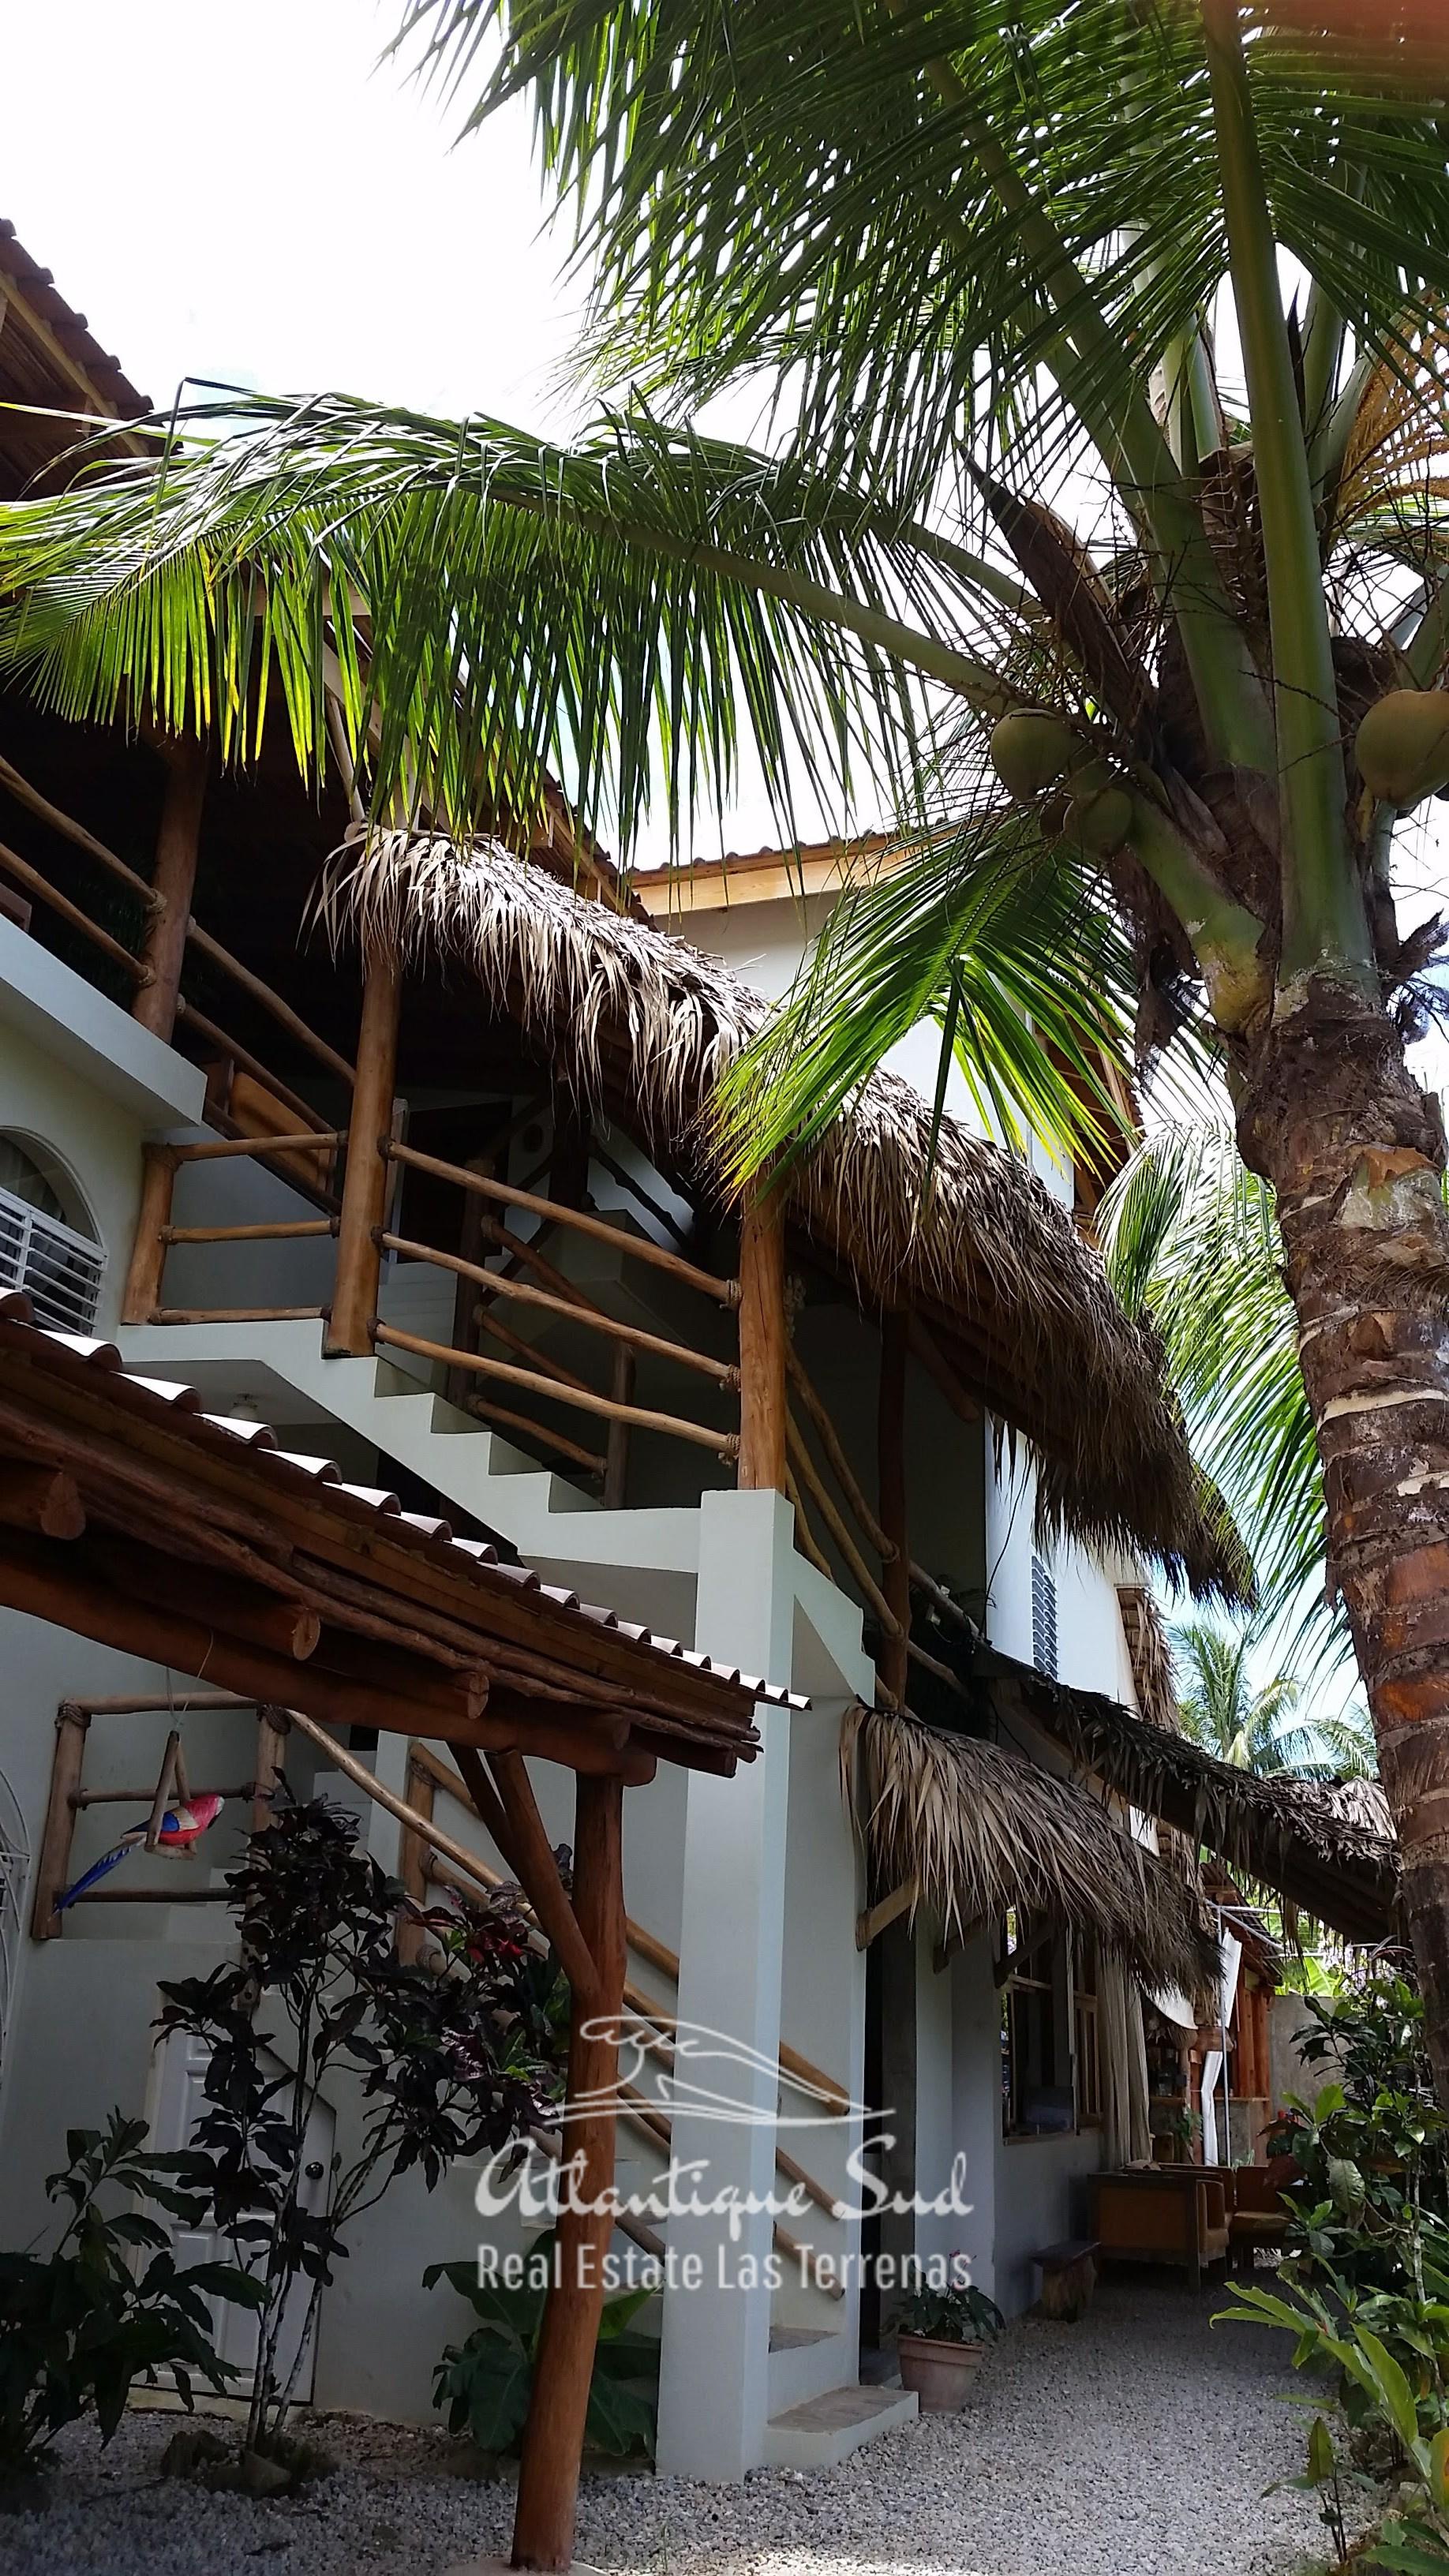 Typical caribbean hotel for sale Real Estate Las Terrenas Dominican Republic Atlantique Sud5.jpg